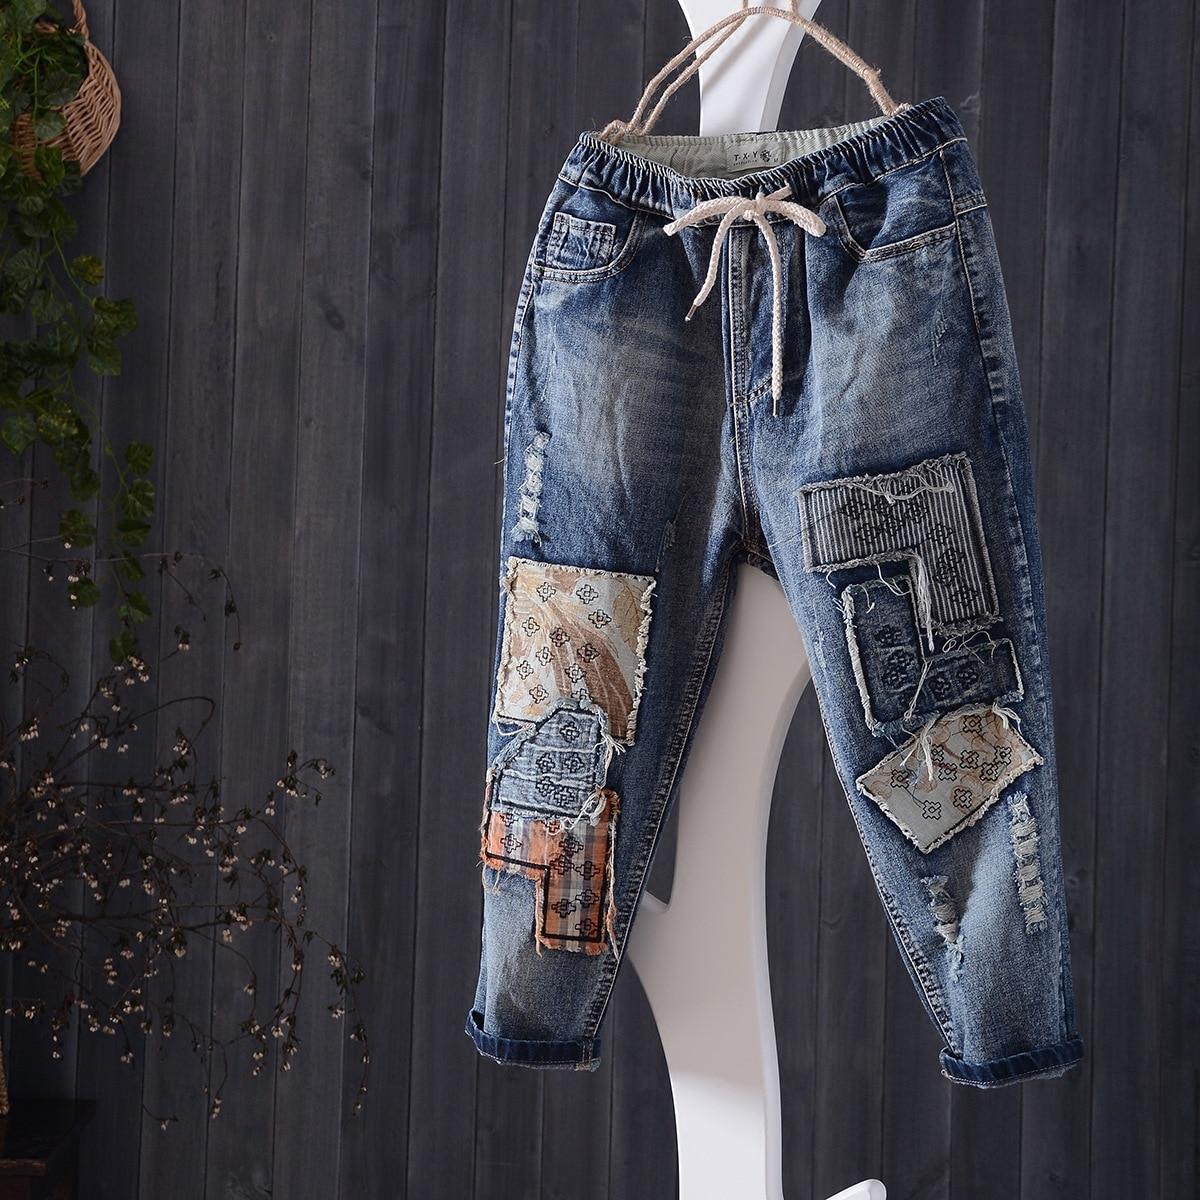 Women Summer Retro Elastic Waist Jeans Loose High Quality Embroidery Slim-type Denim Trousers 2017 Female New Denim Pants Ripped